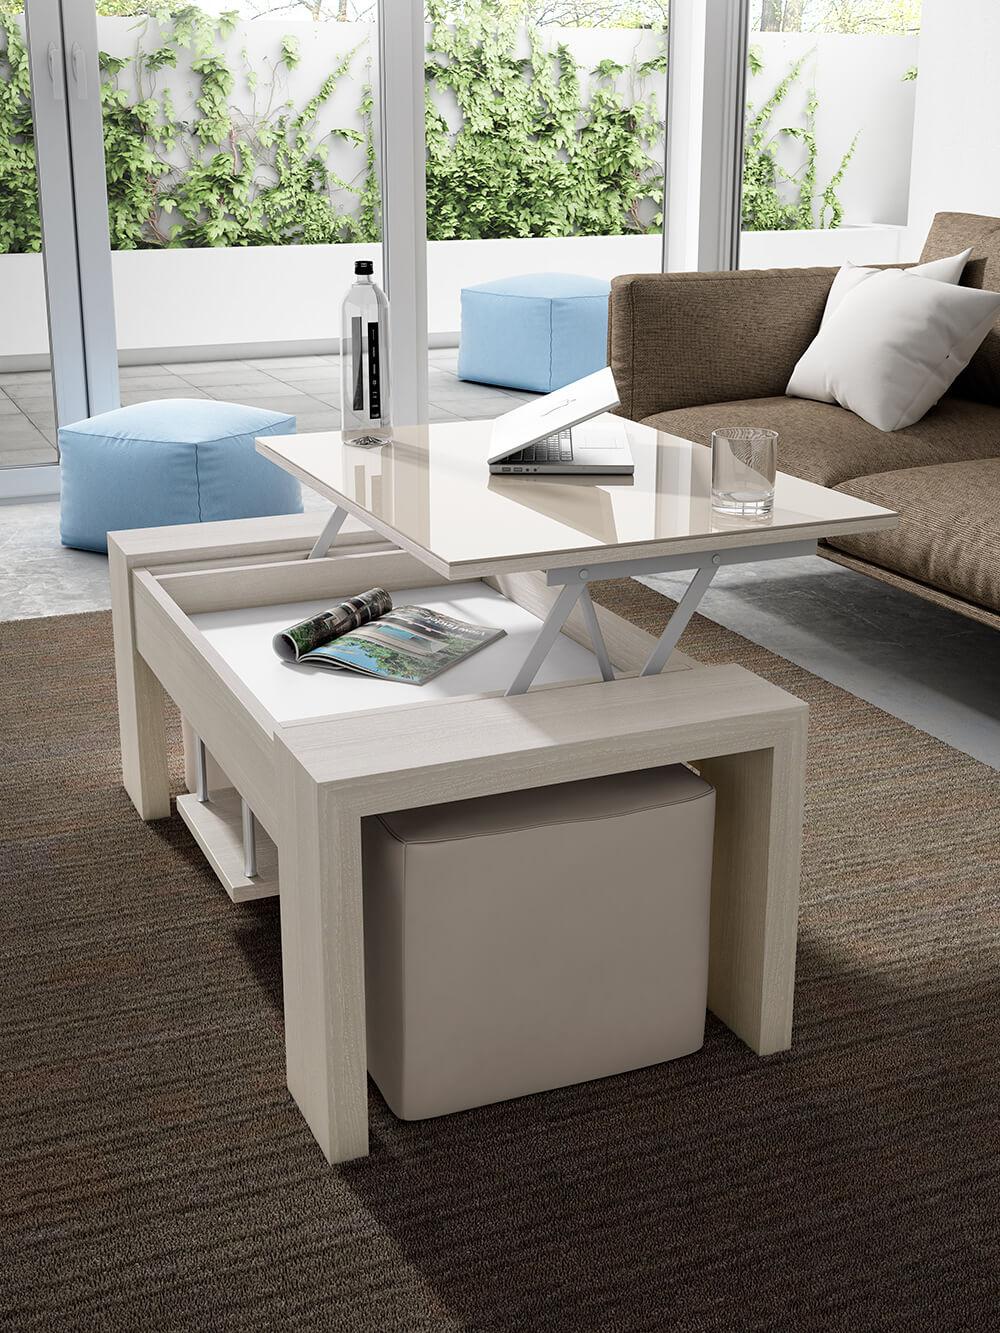 8a9886f8031 awesome mesa de centro elevable con detalle porcelnico o cristal y puffs  with mesa centro extensible y elevable